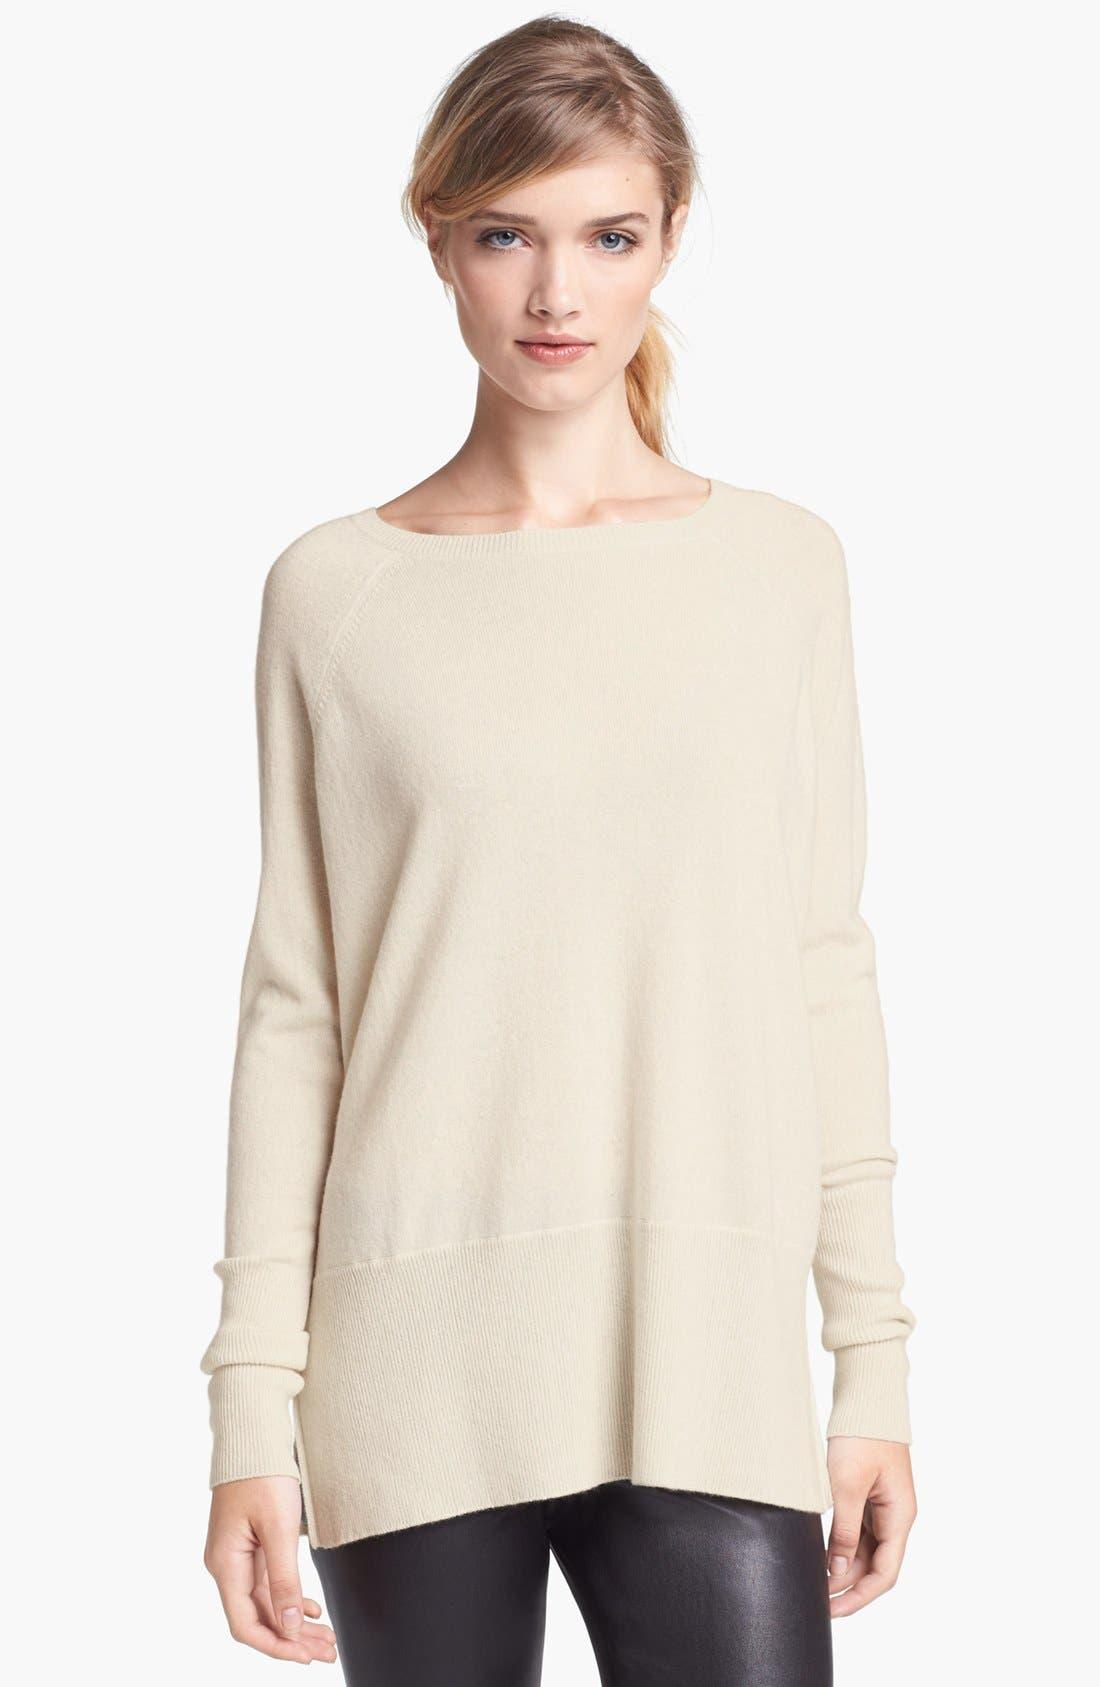 Main Image - Vince 'Square' Raglan Cashmere Sweater